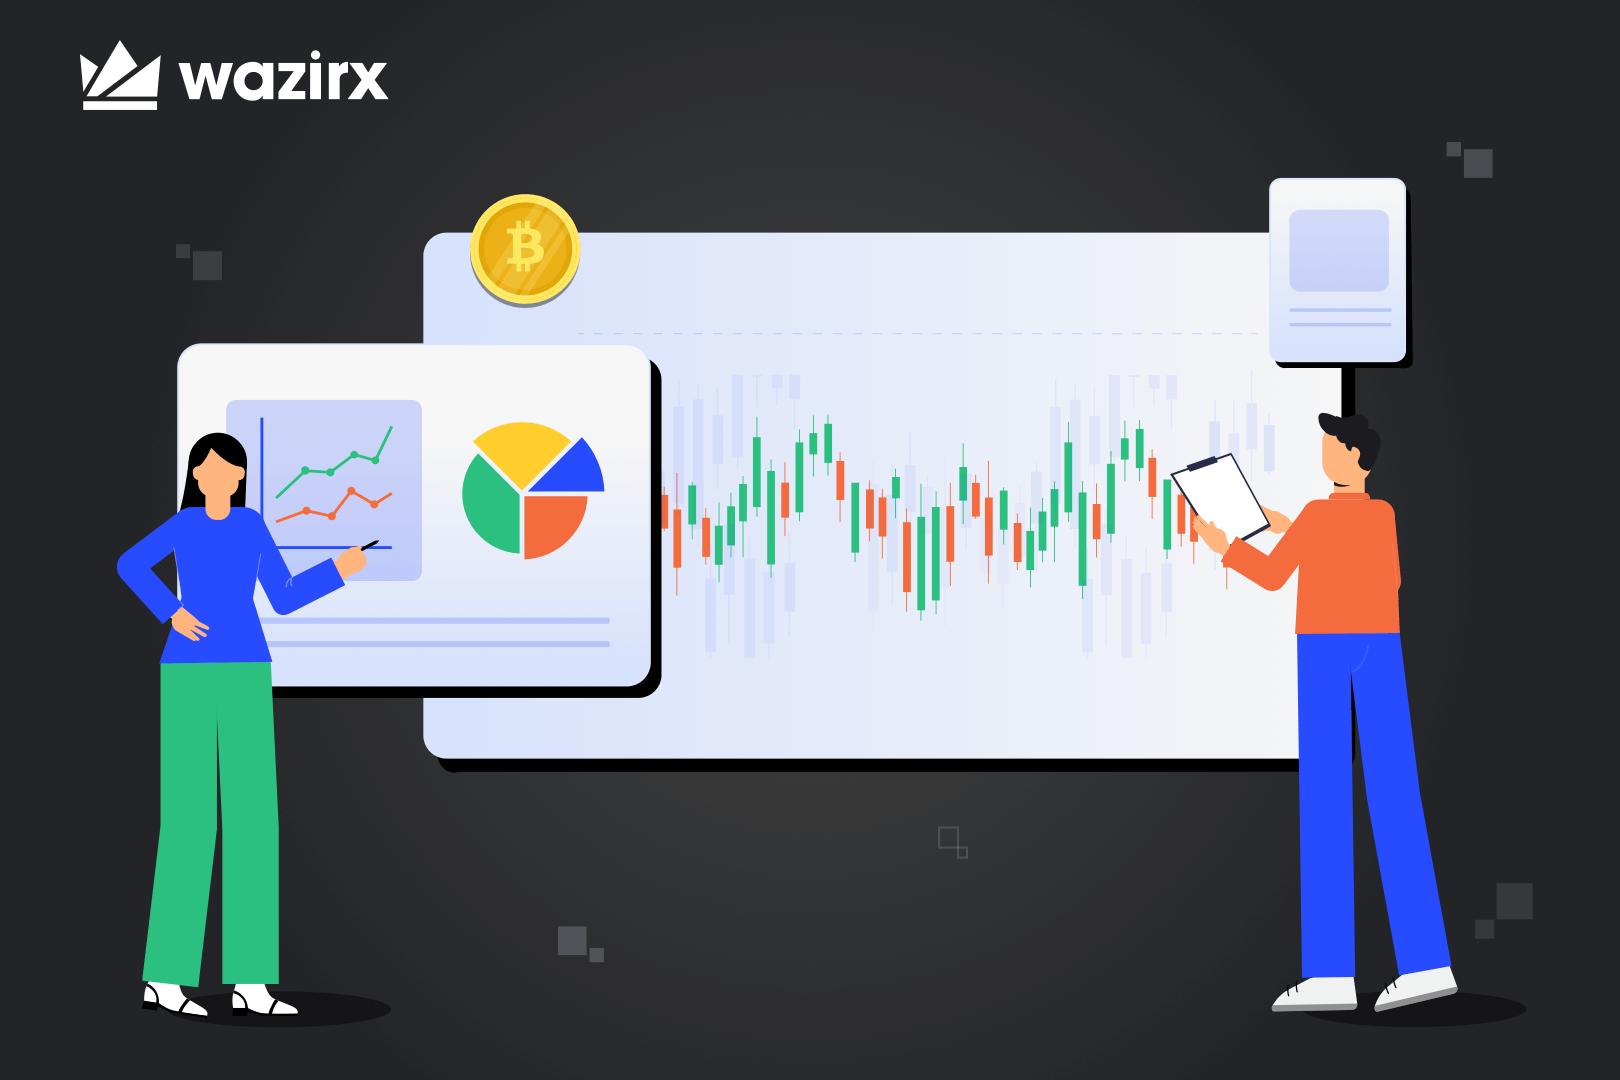 Critical bitcoin price prediction for 2021_WazirX